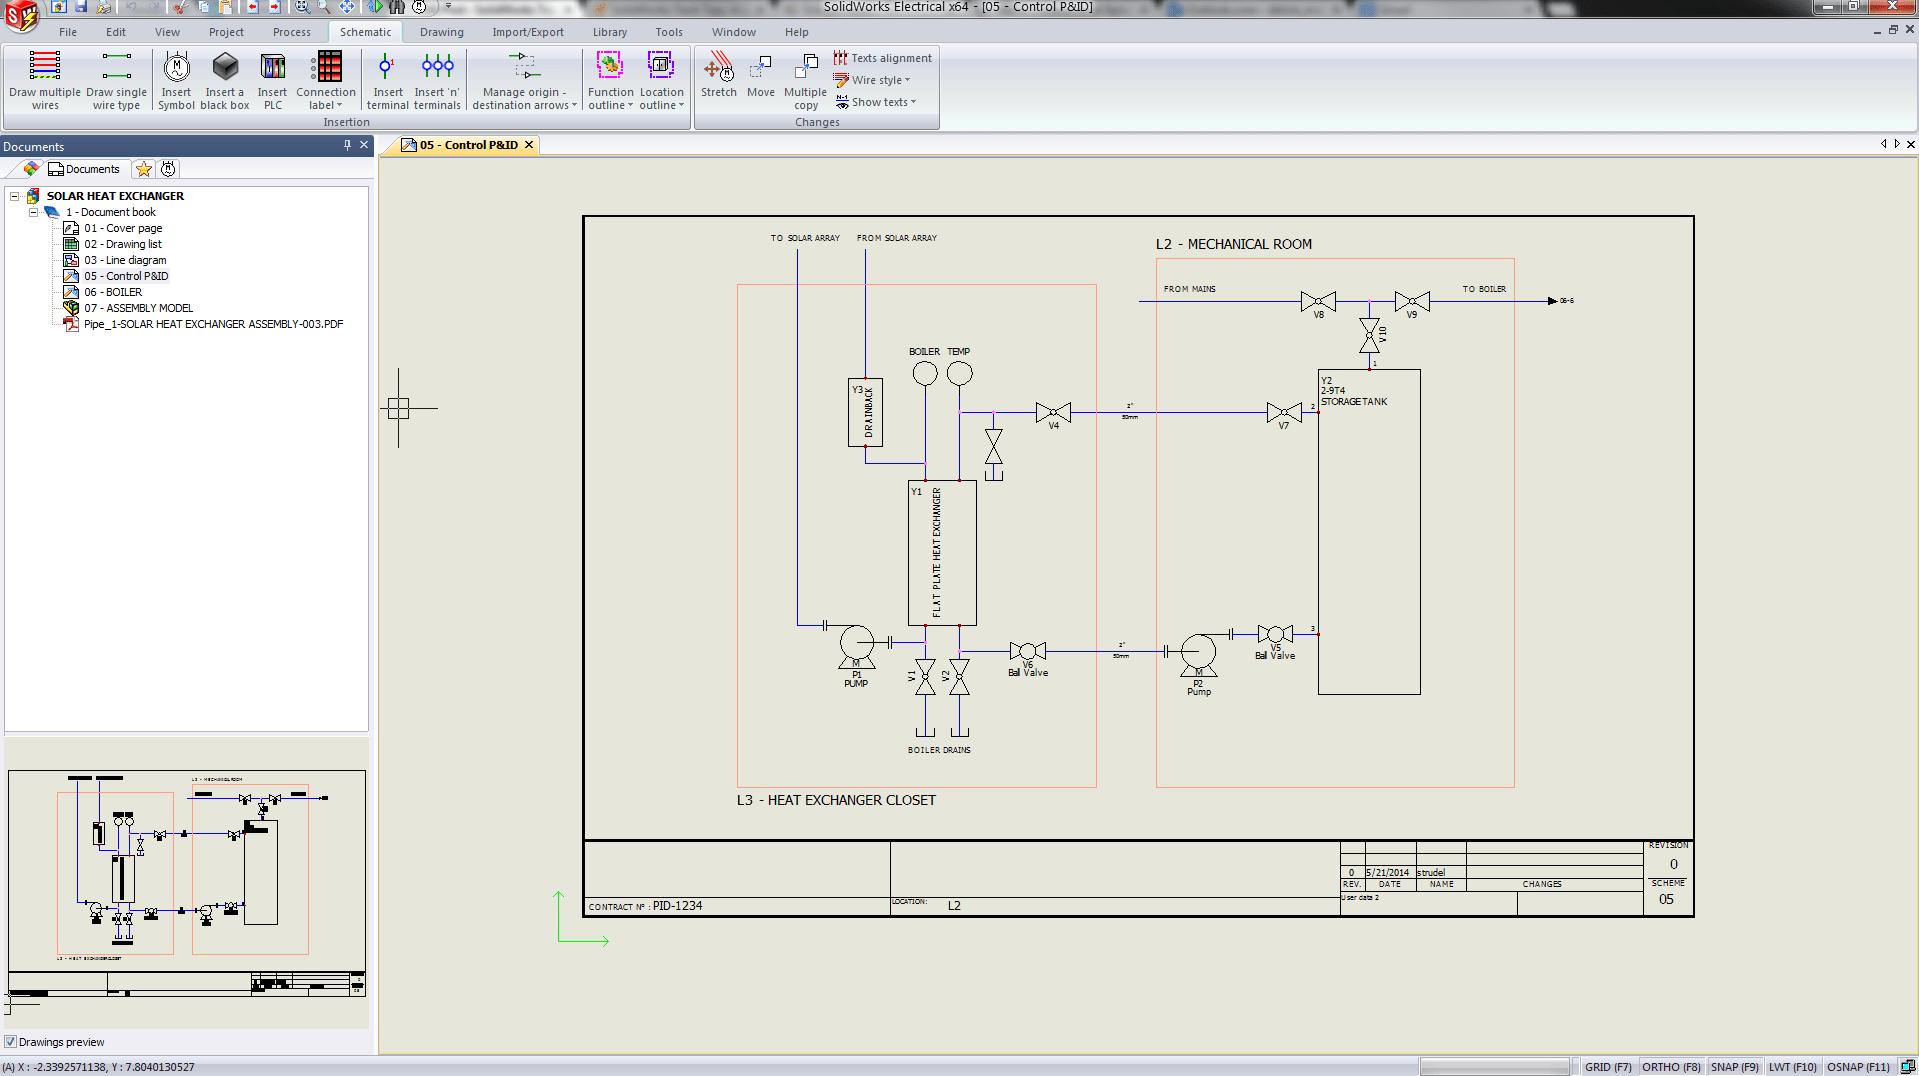 draw wiring diagrams 1991 honda crx stereo diagram electrical p andid drawings  the readingrat